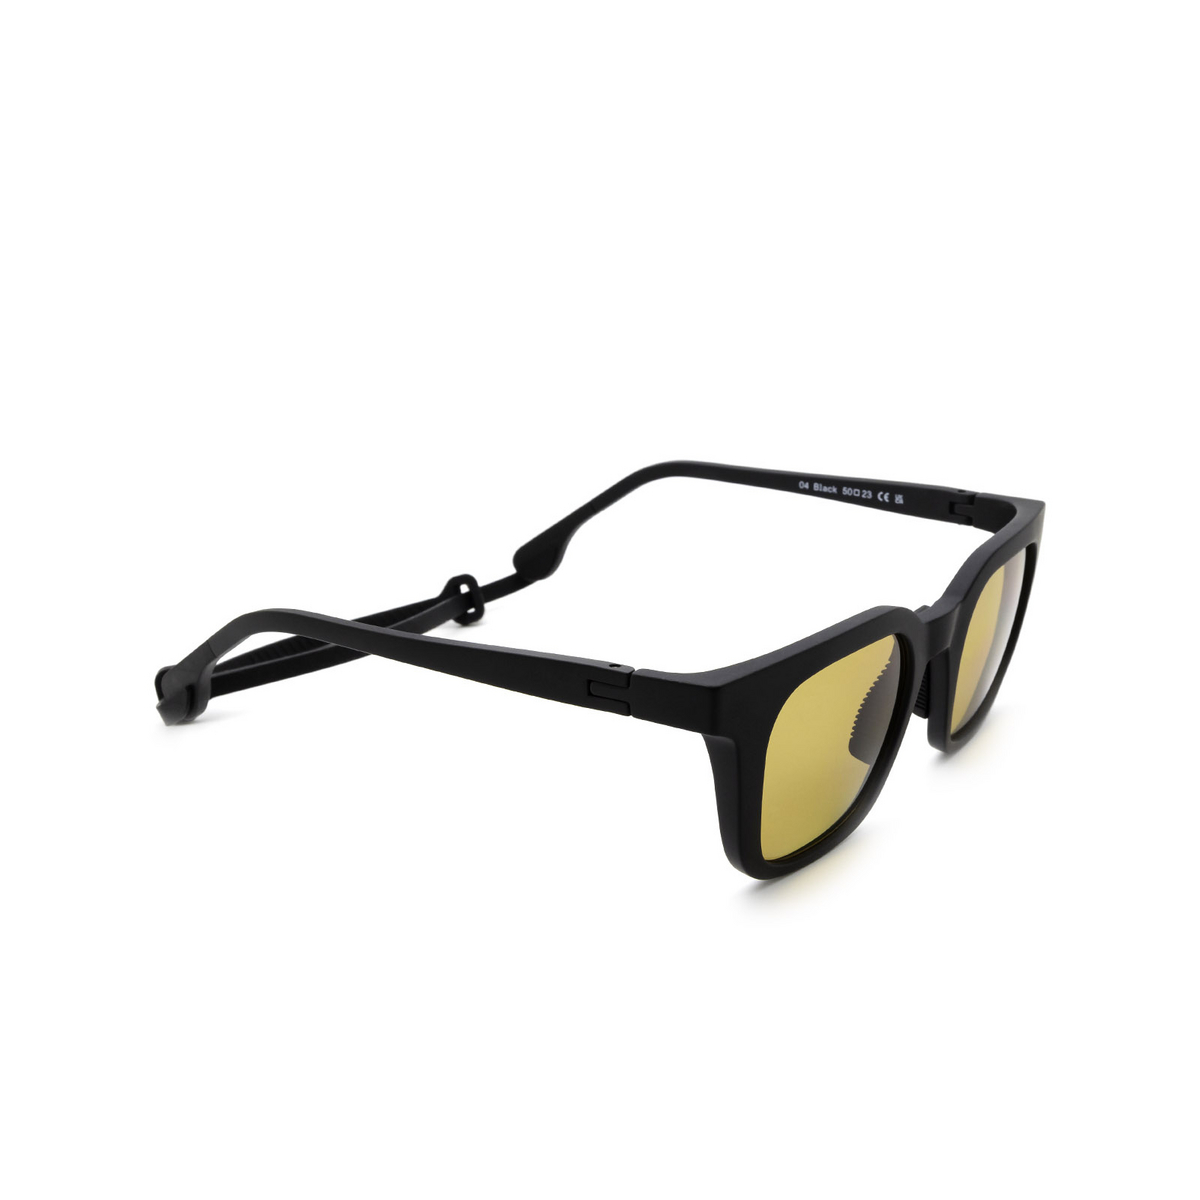 Chimi® Square Sunglasses: 04 ACTIVE color Black - three-quarters view.